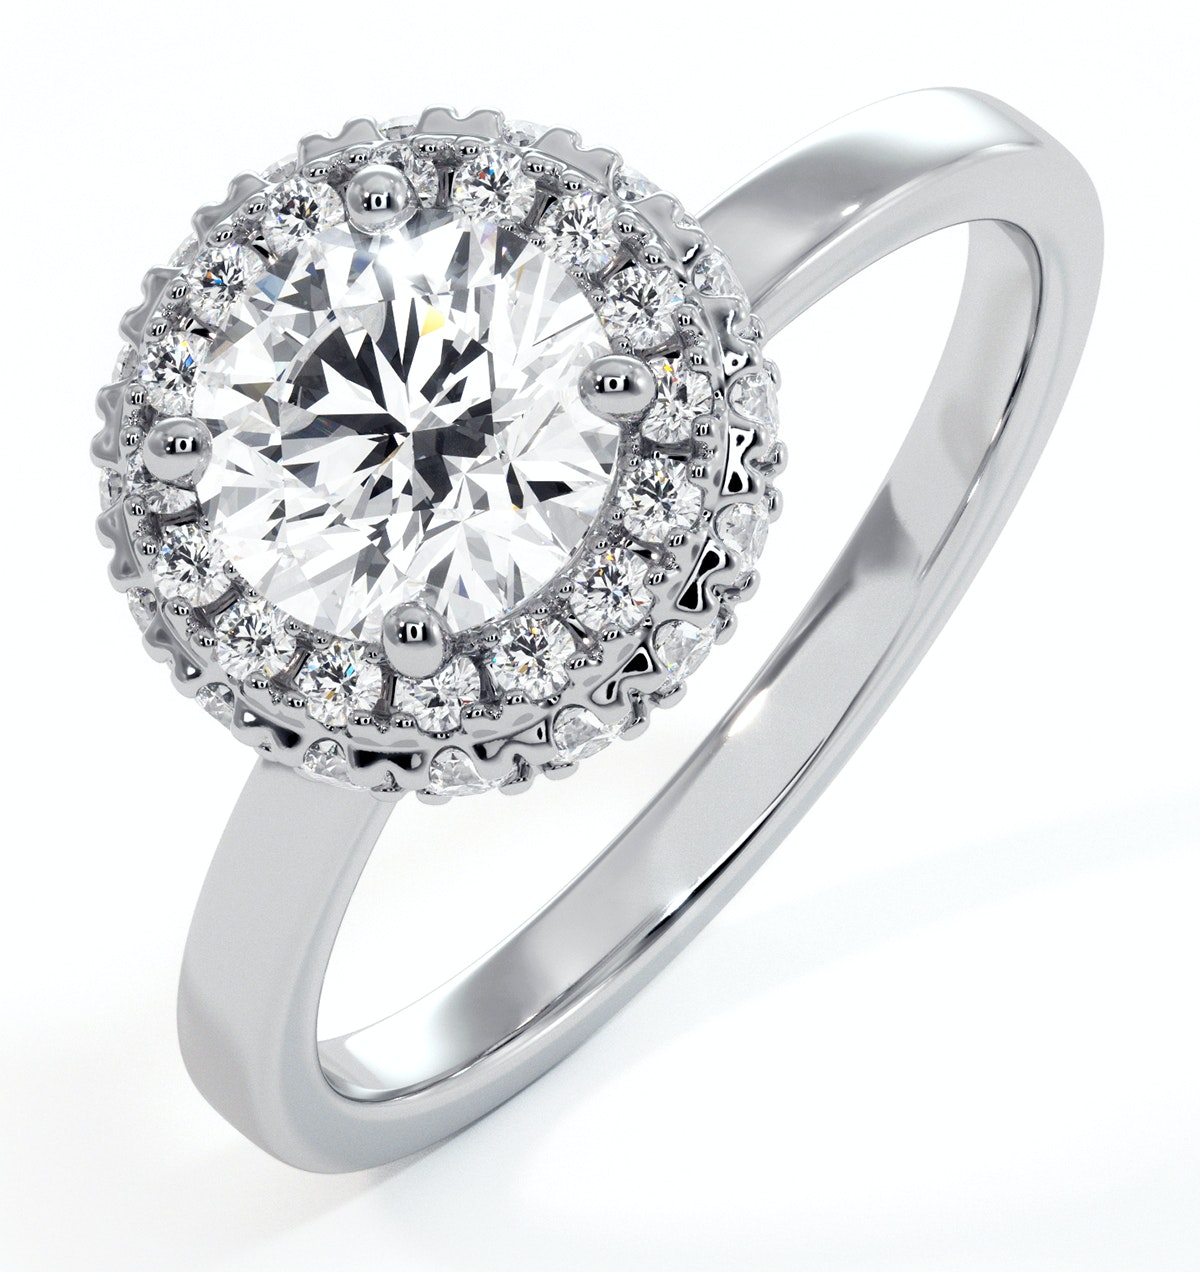 Eleanor GIA Diamond Halo Engagement Ring in Platinum 1.09ct G/SI1